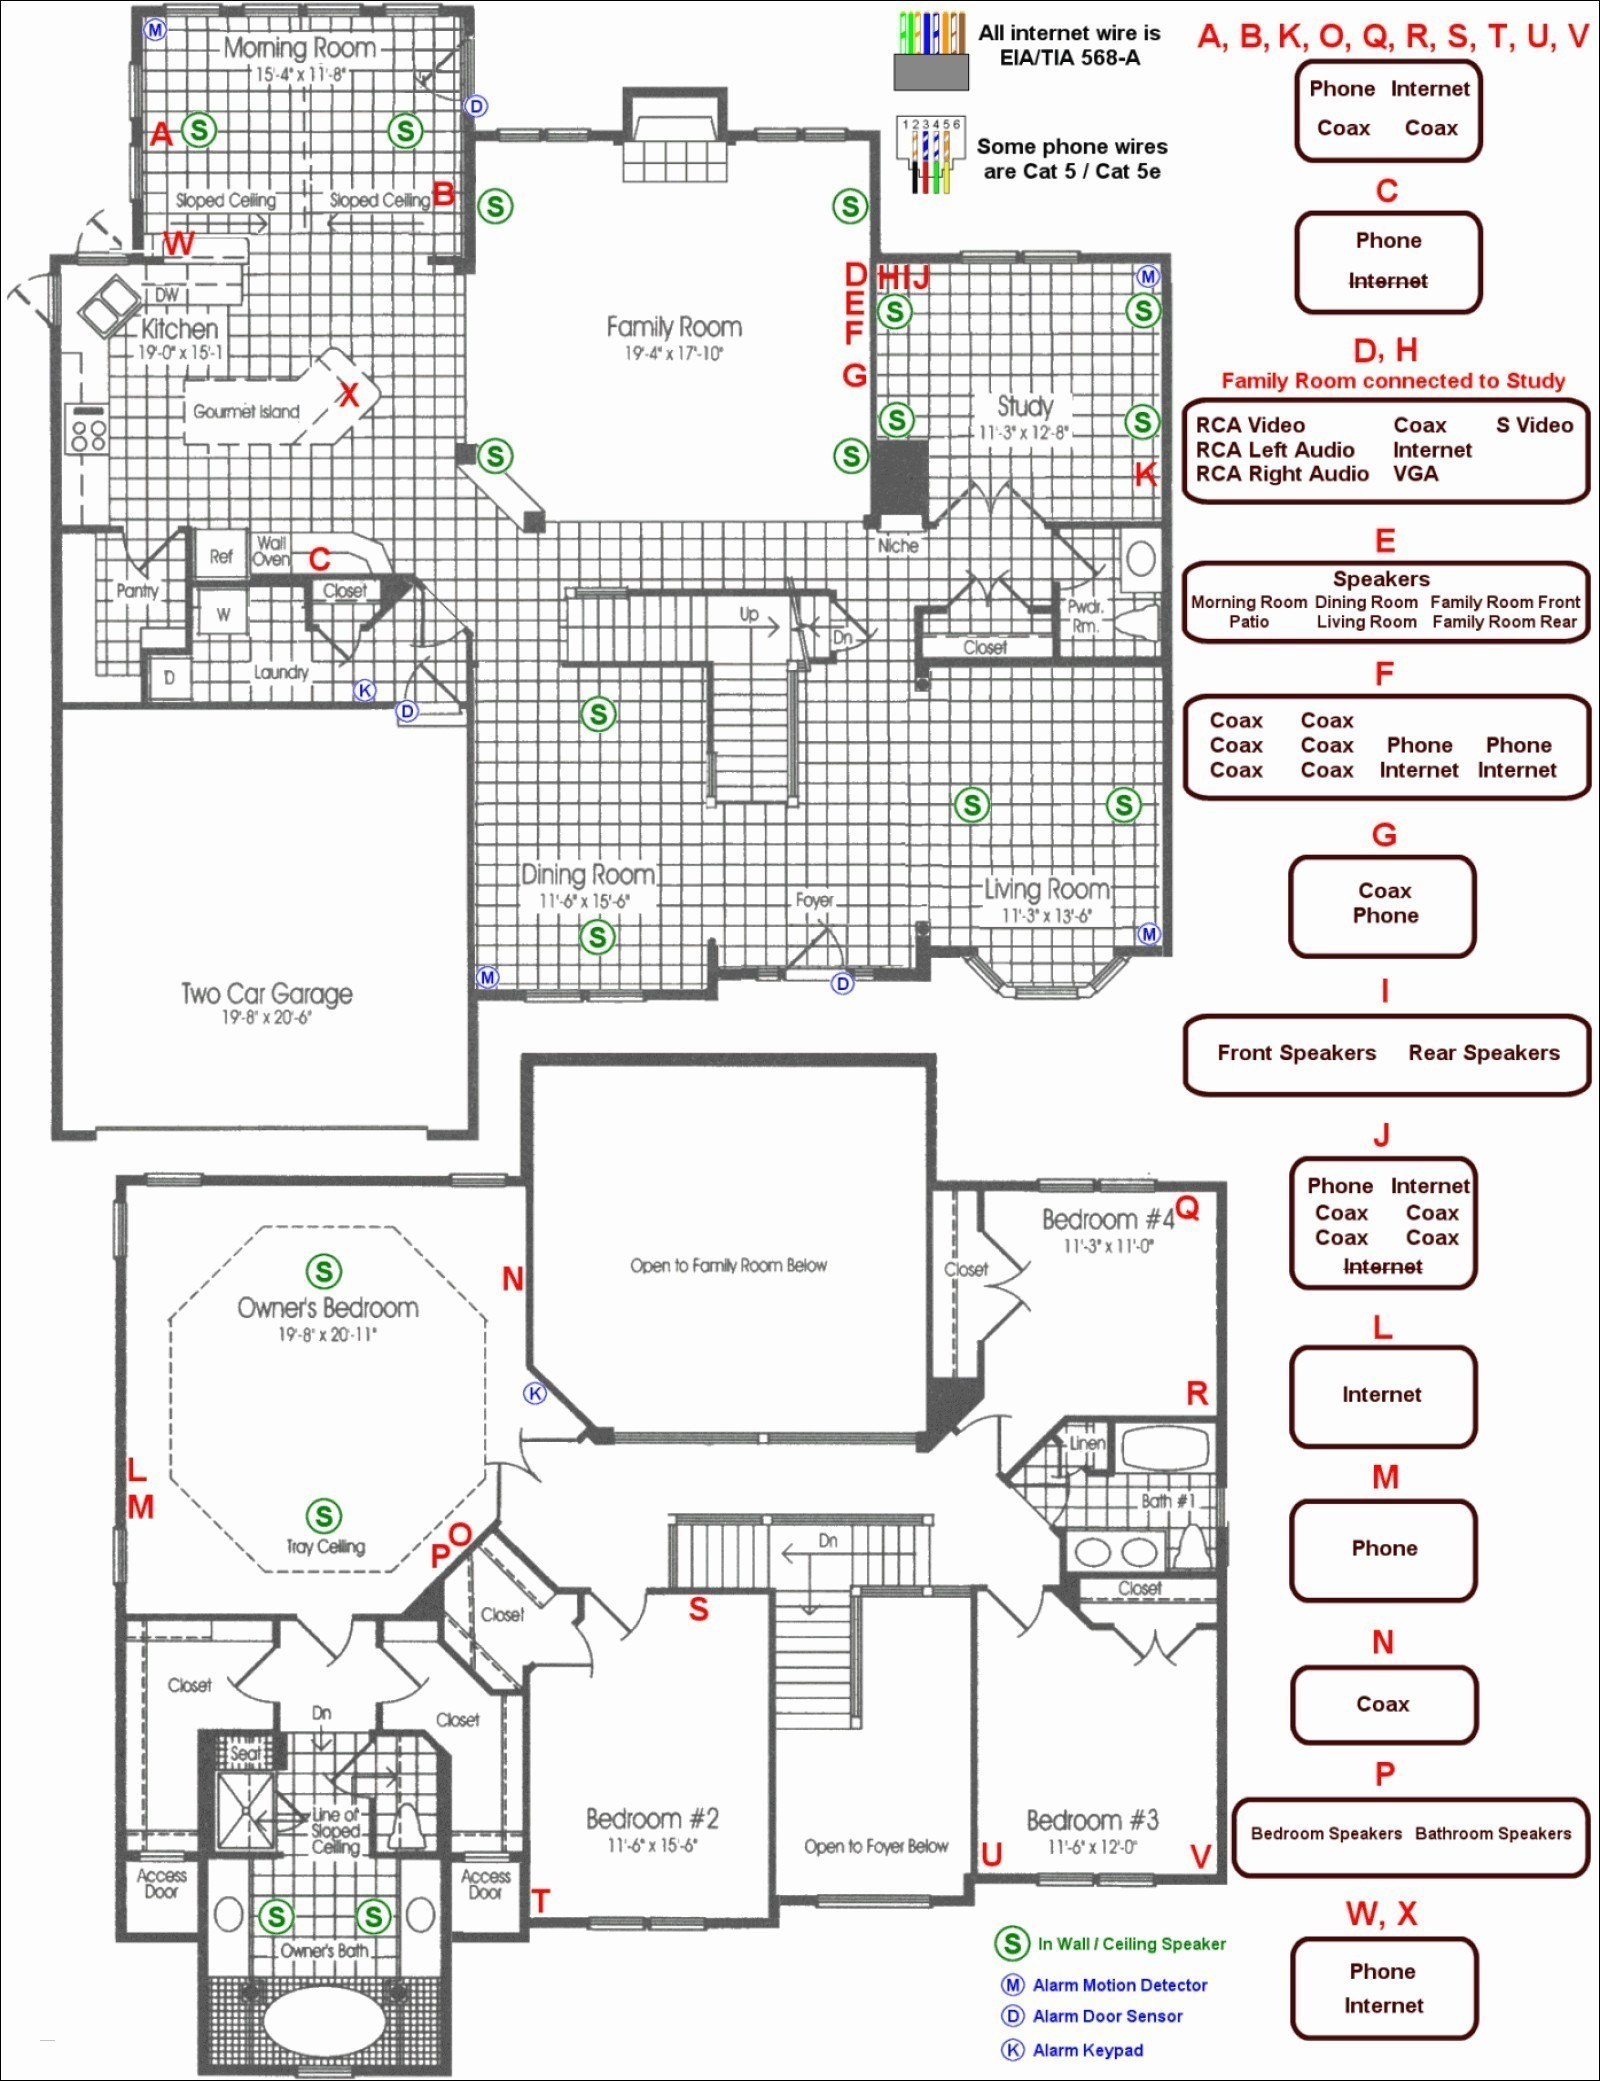 House Wiring Plan Drawing Awesome Electrical Wiring Diagram Symbols Sample